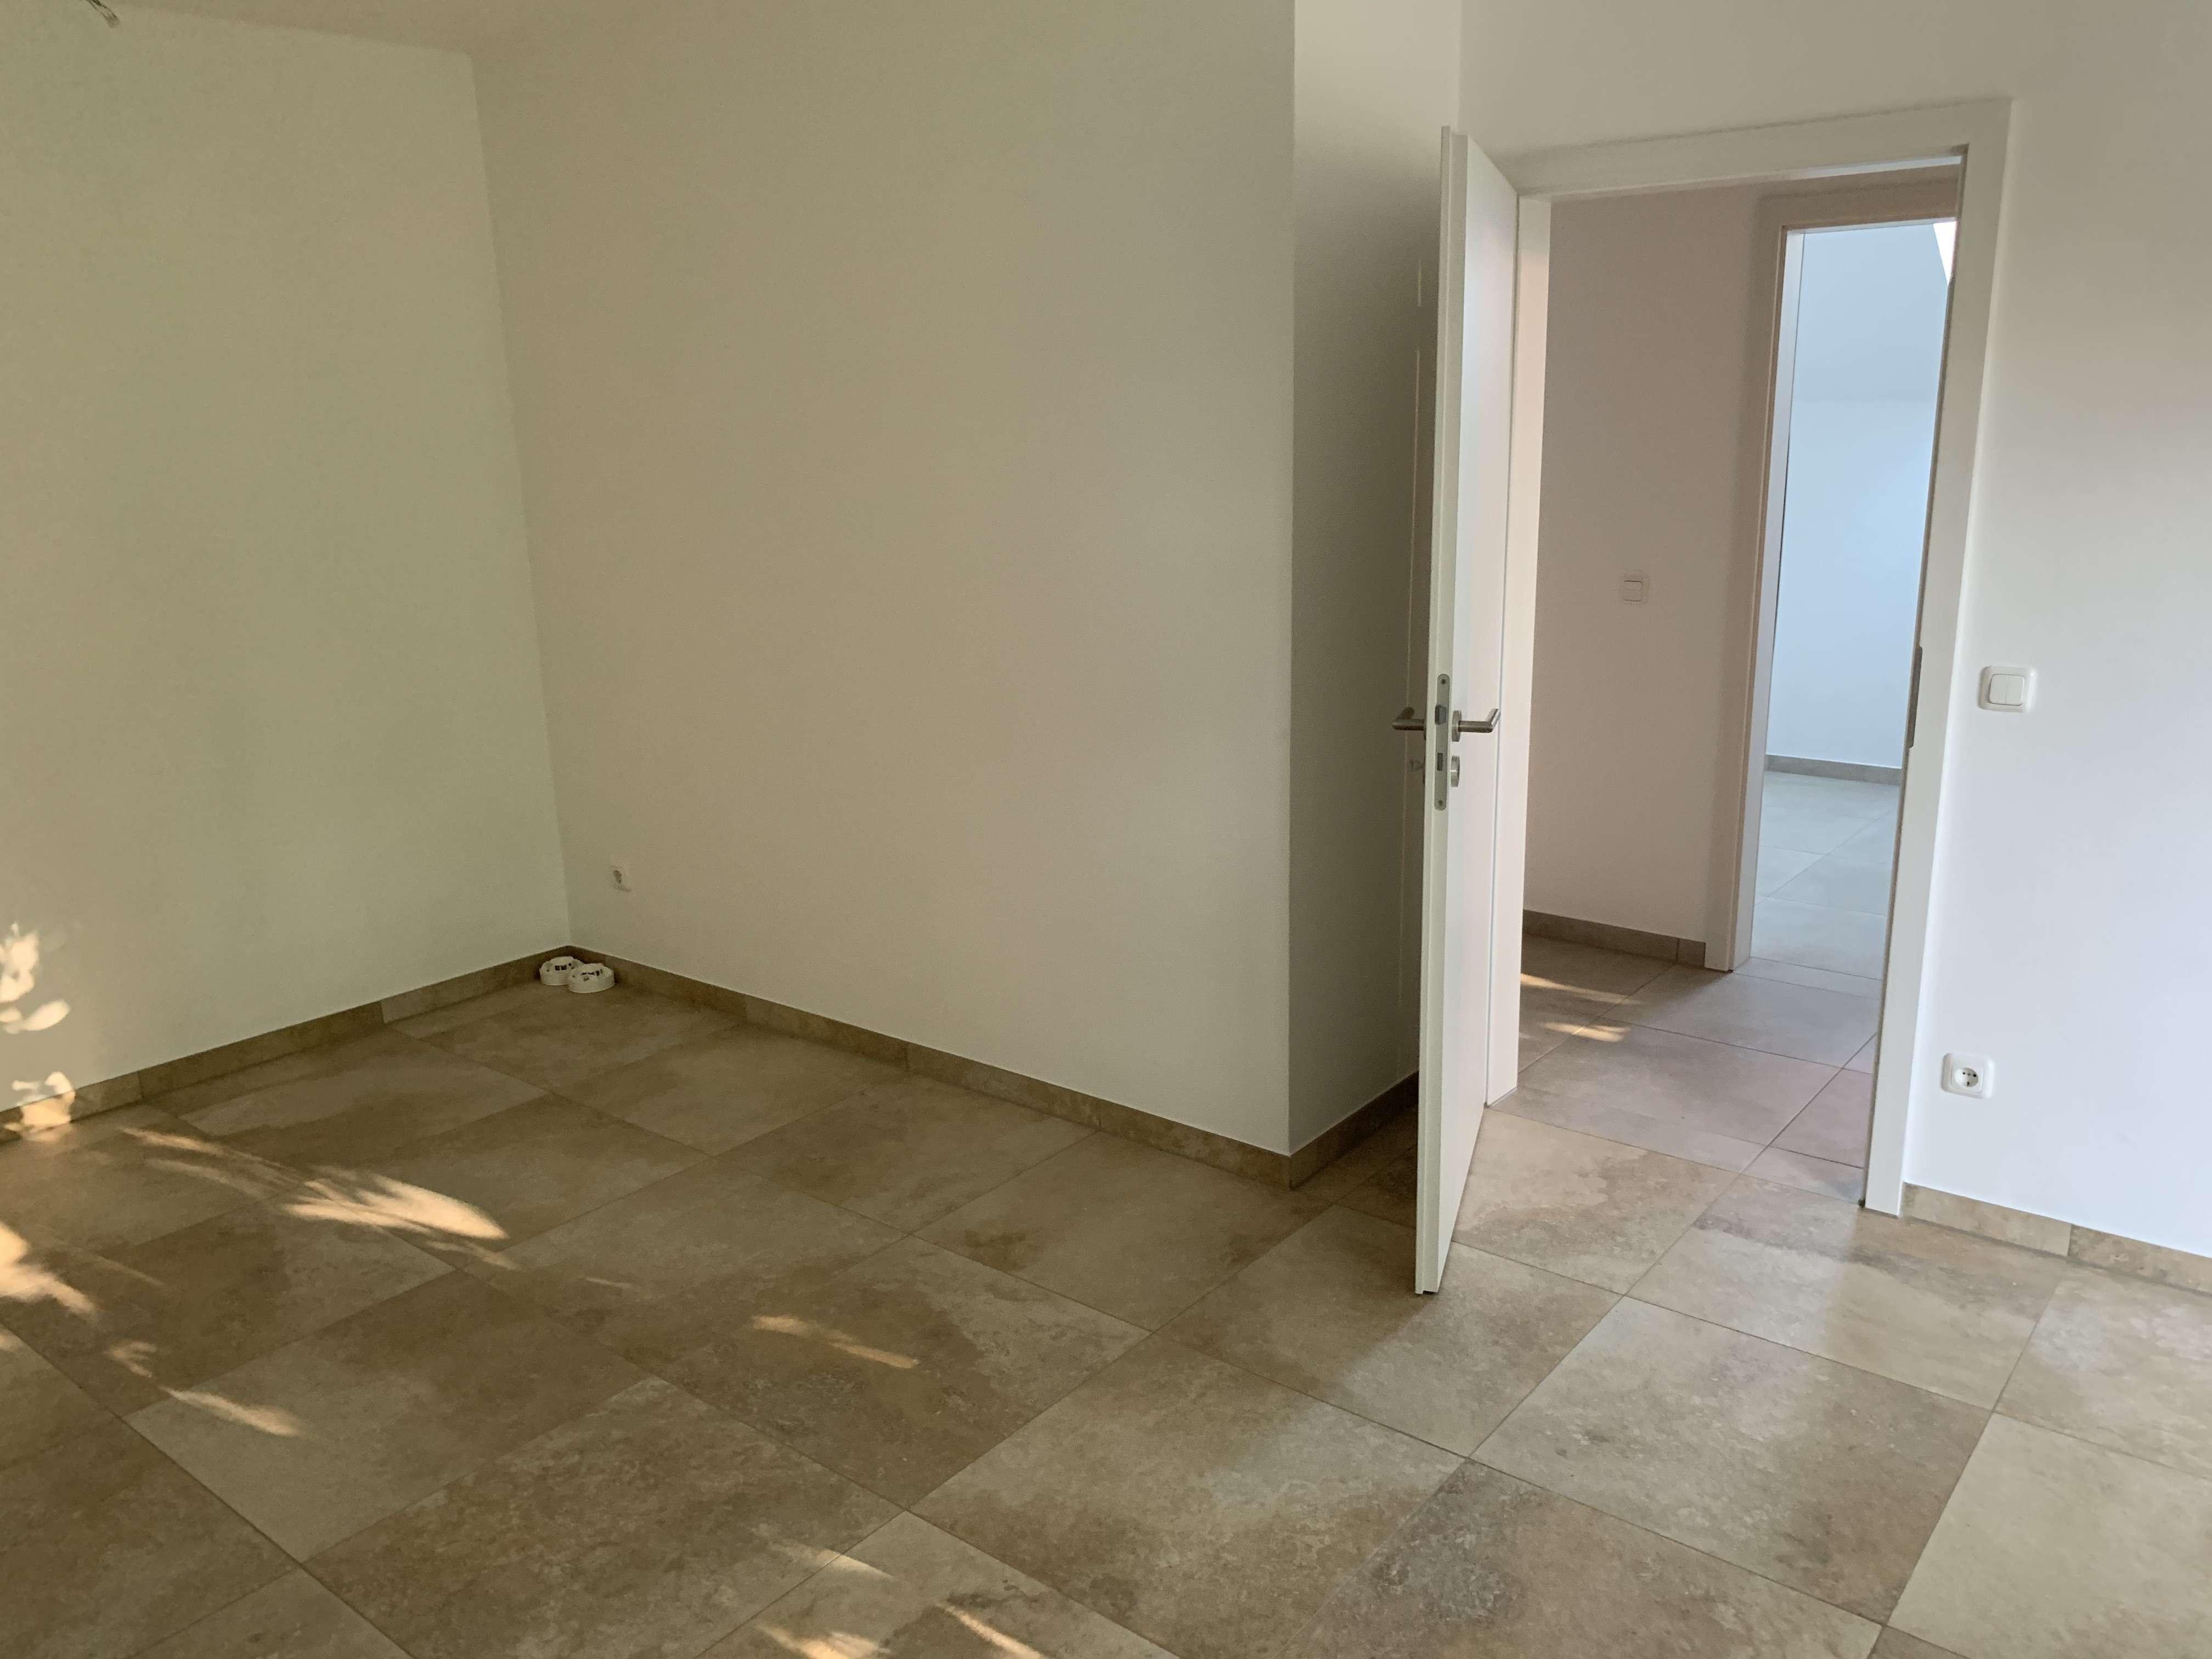 Dachgeschoss-Wohnung in zentraler Lage in